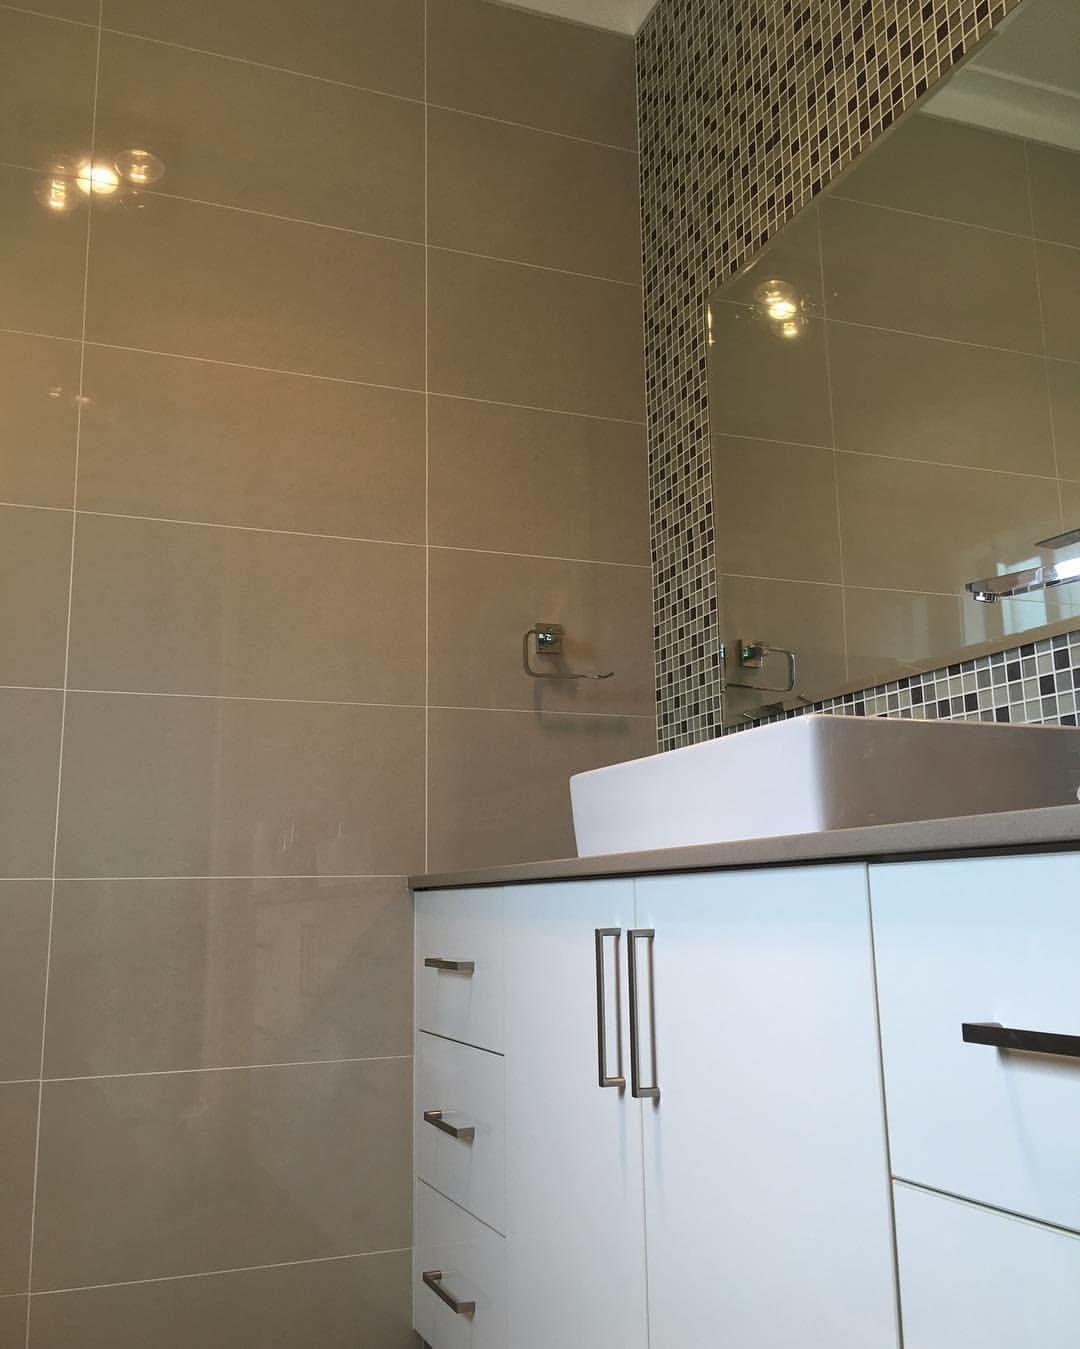 Bathroom Renovations Hawkesbury ensuite renovations from parramatta to hawkesbury, western sydney